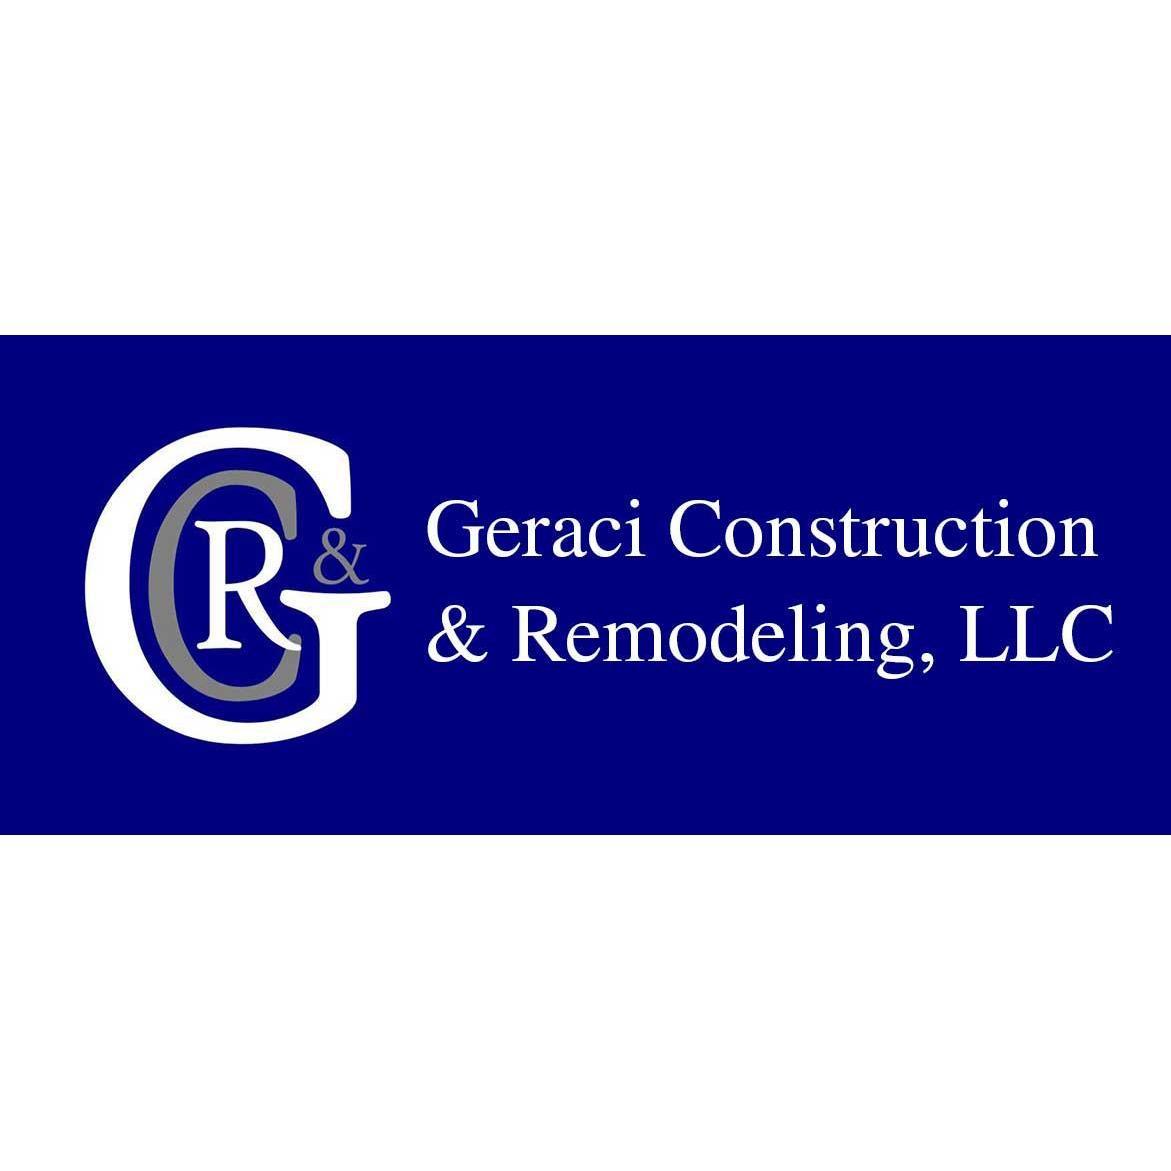 Geraci Construction & Remodeling, LLC